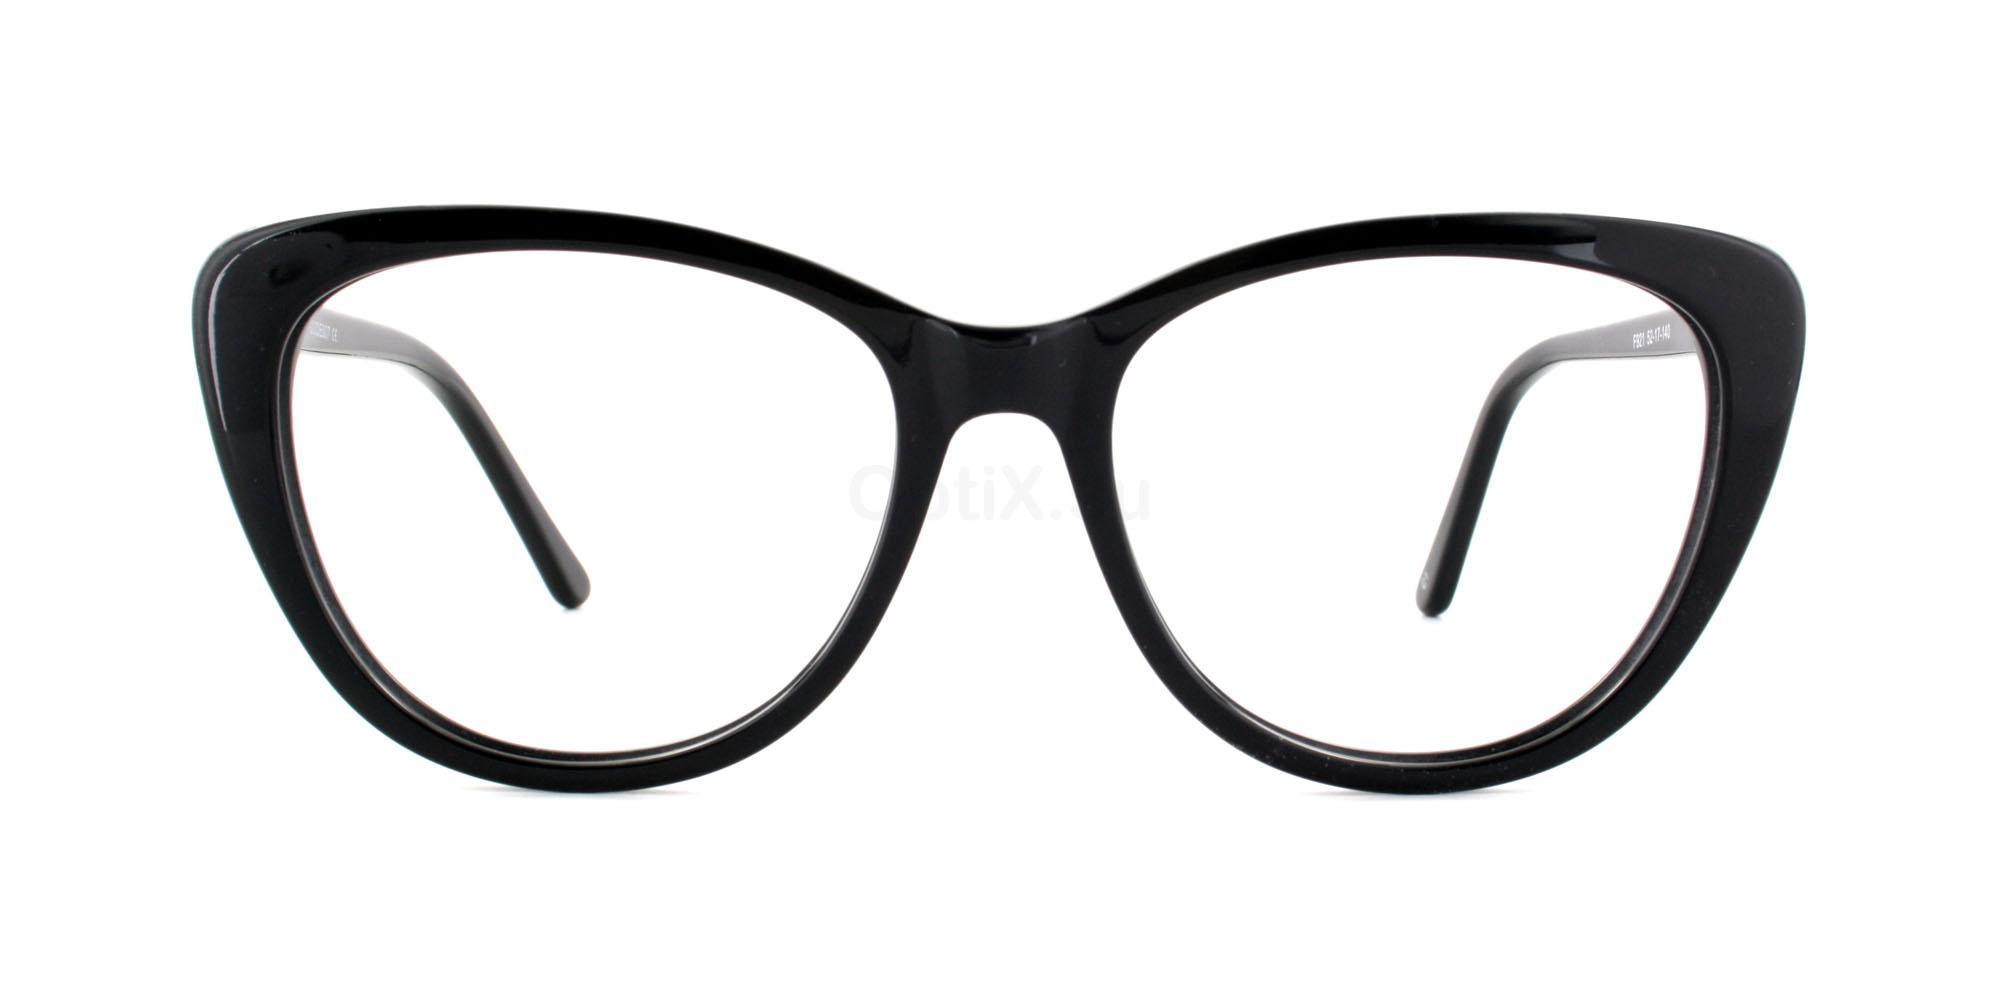 C1 A921 Glasses, SelectSpecs